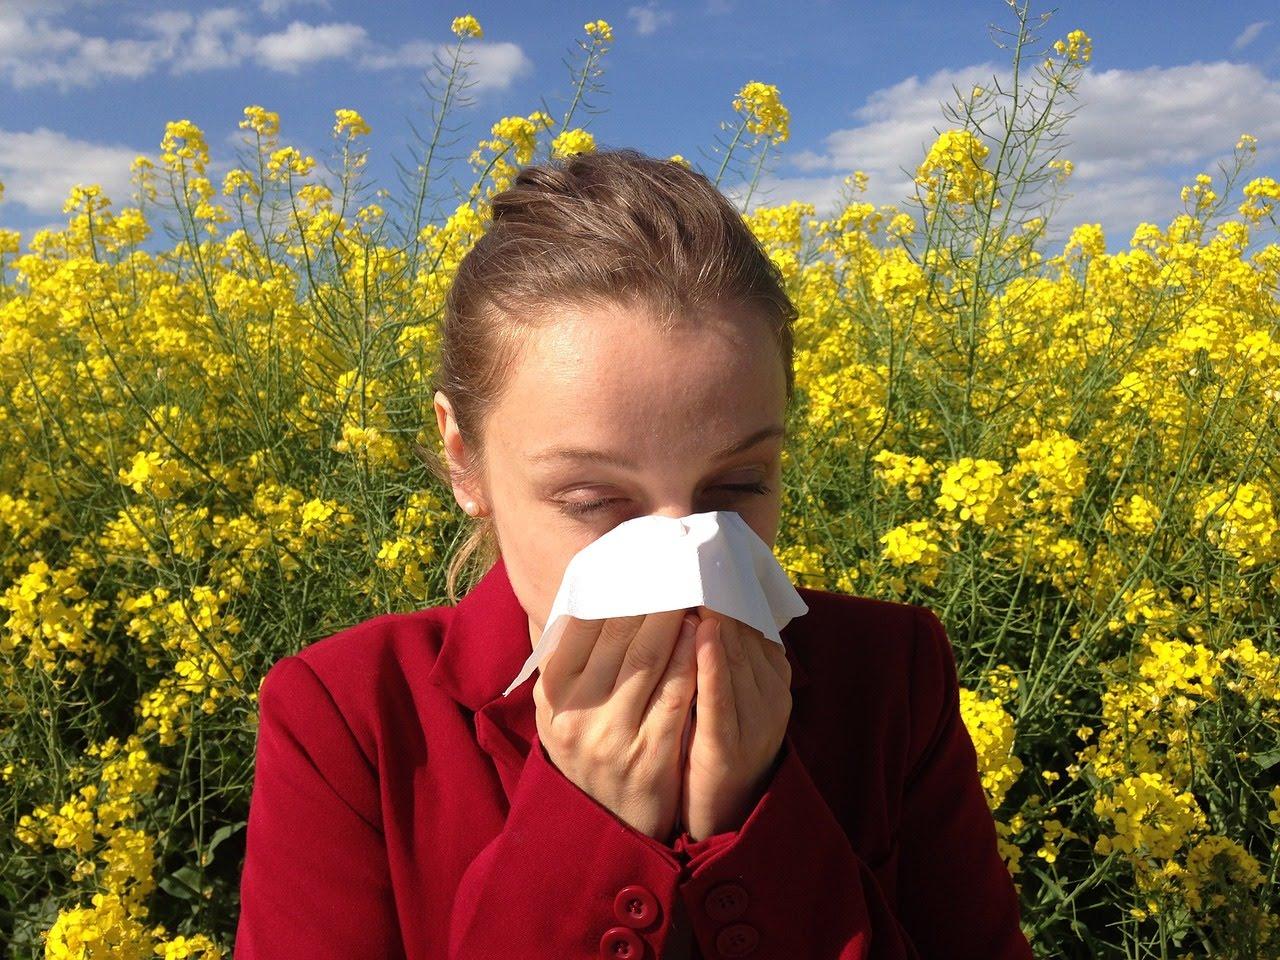 Natural Relief For Seasonal Allergies